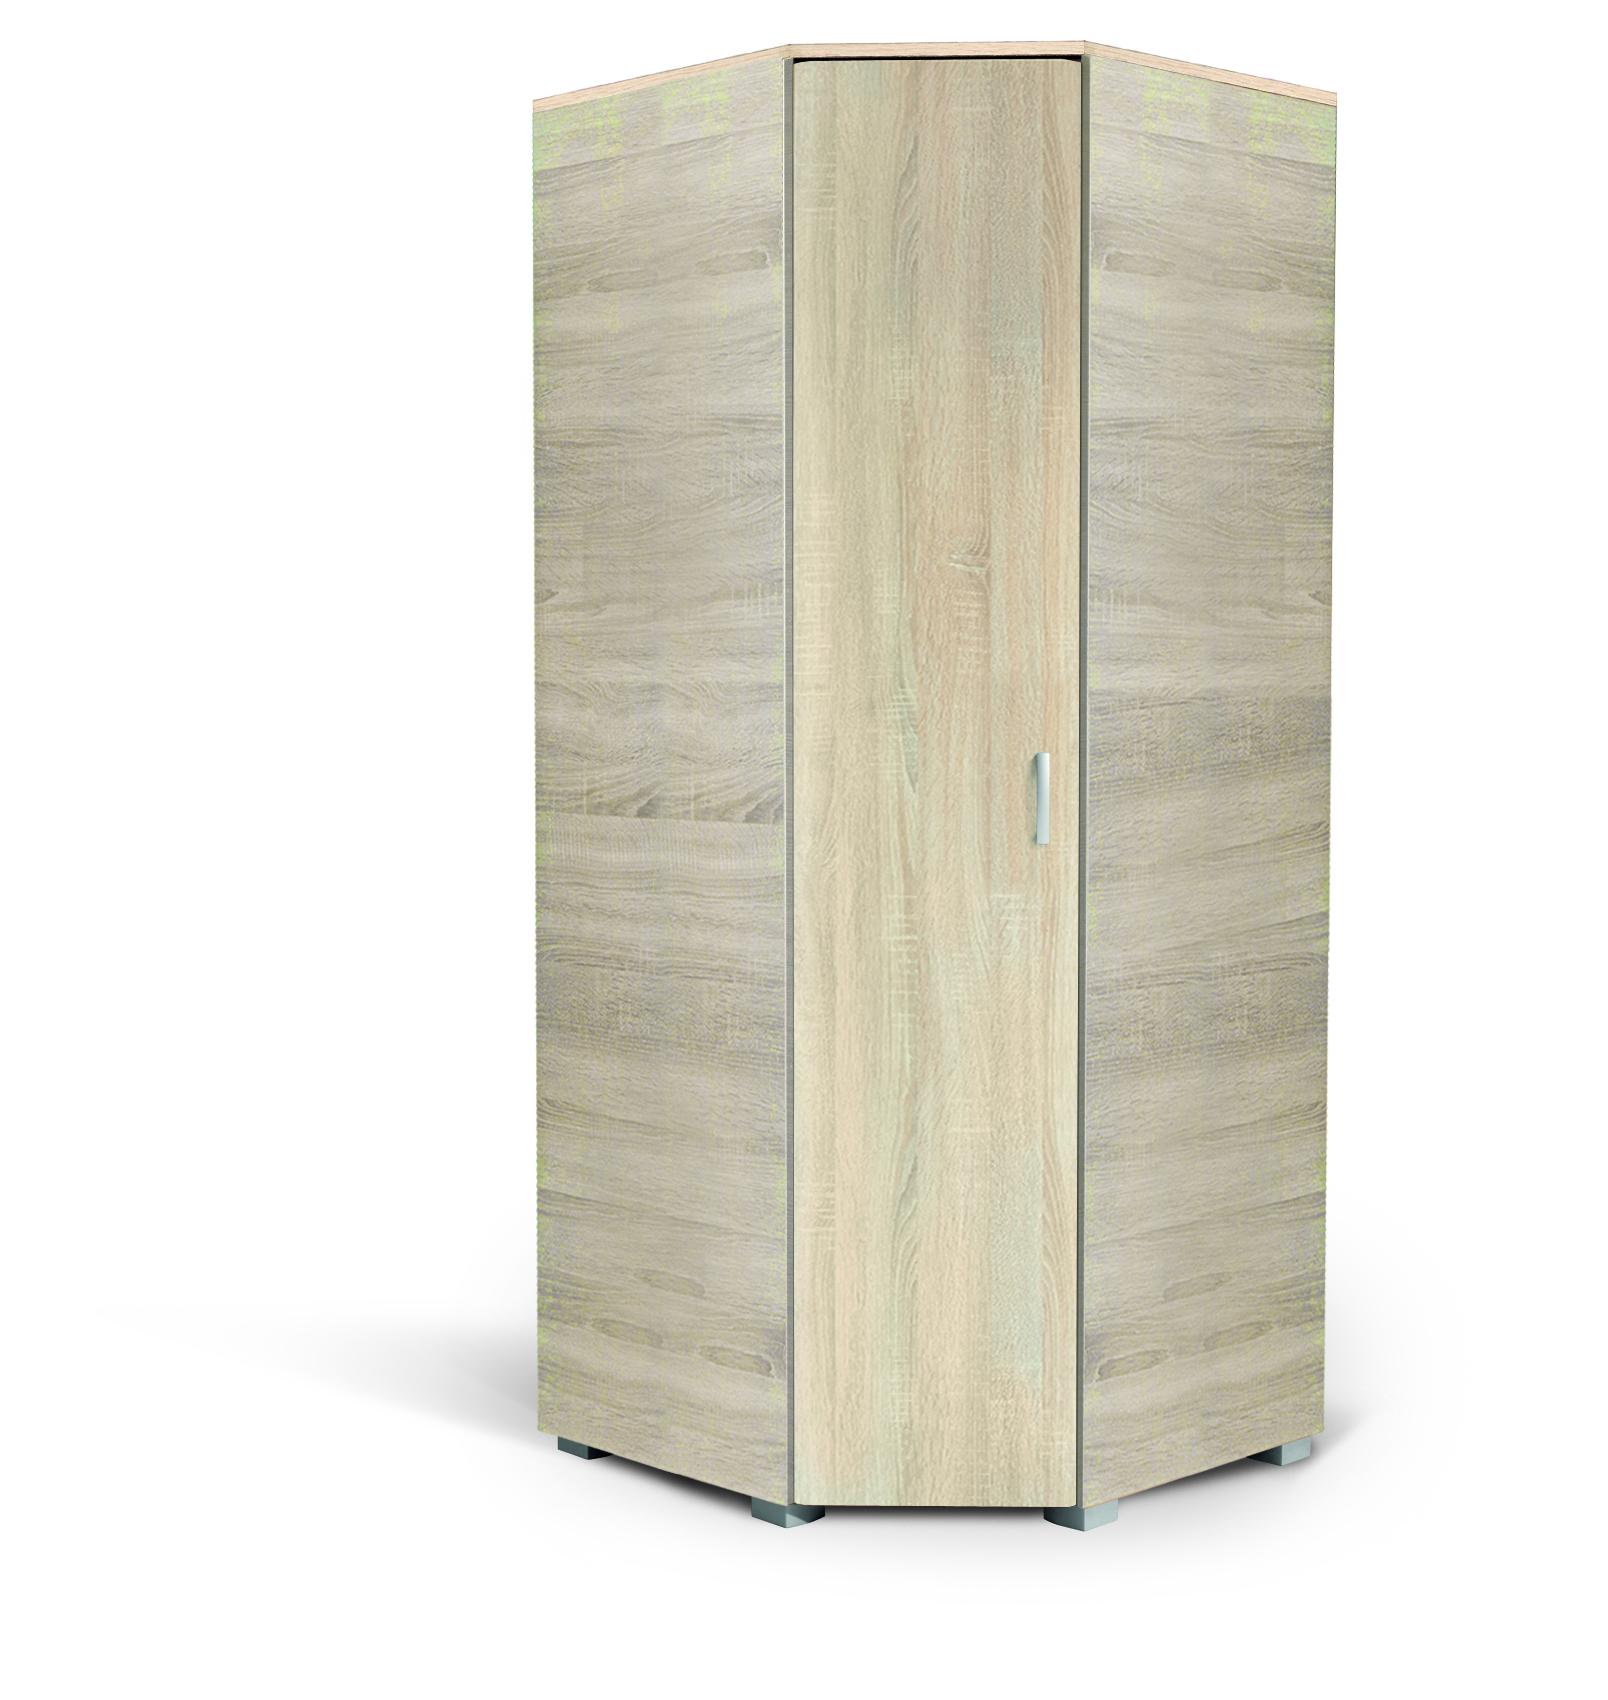 MATIS MILANO, rohová skříň, dub bardolino